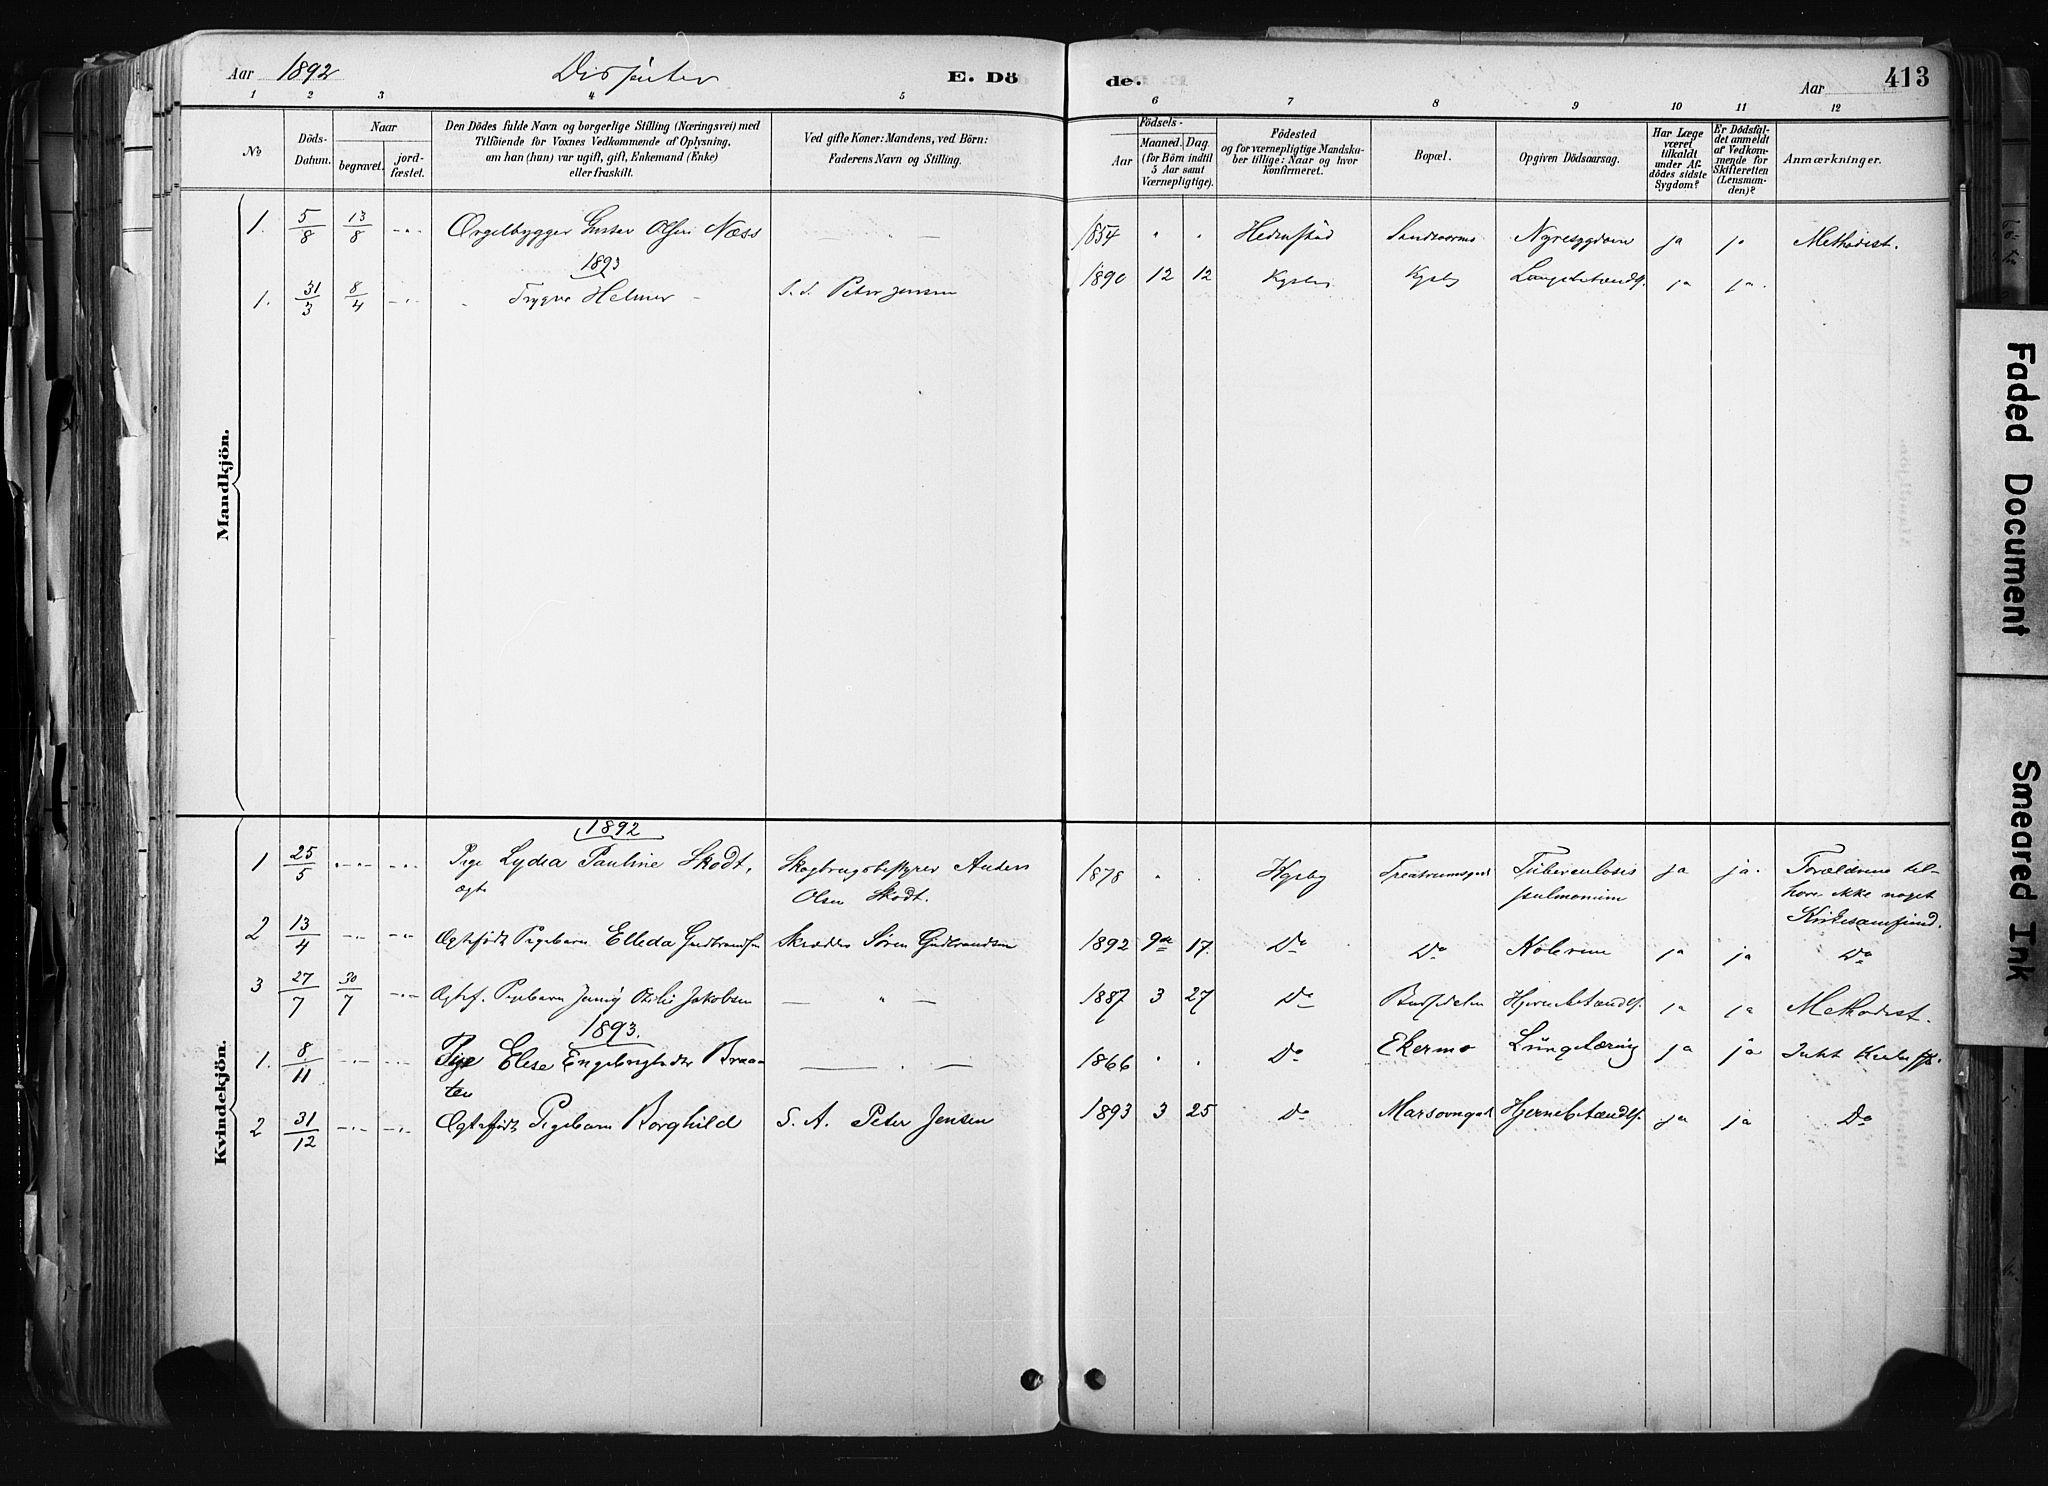 SAKO, Kongsberg kirkebøker, F/Fb/L0002: Ministerialbok nr. II 2, 1886-1896, s. 413